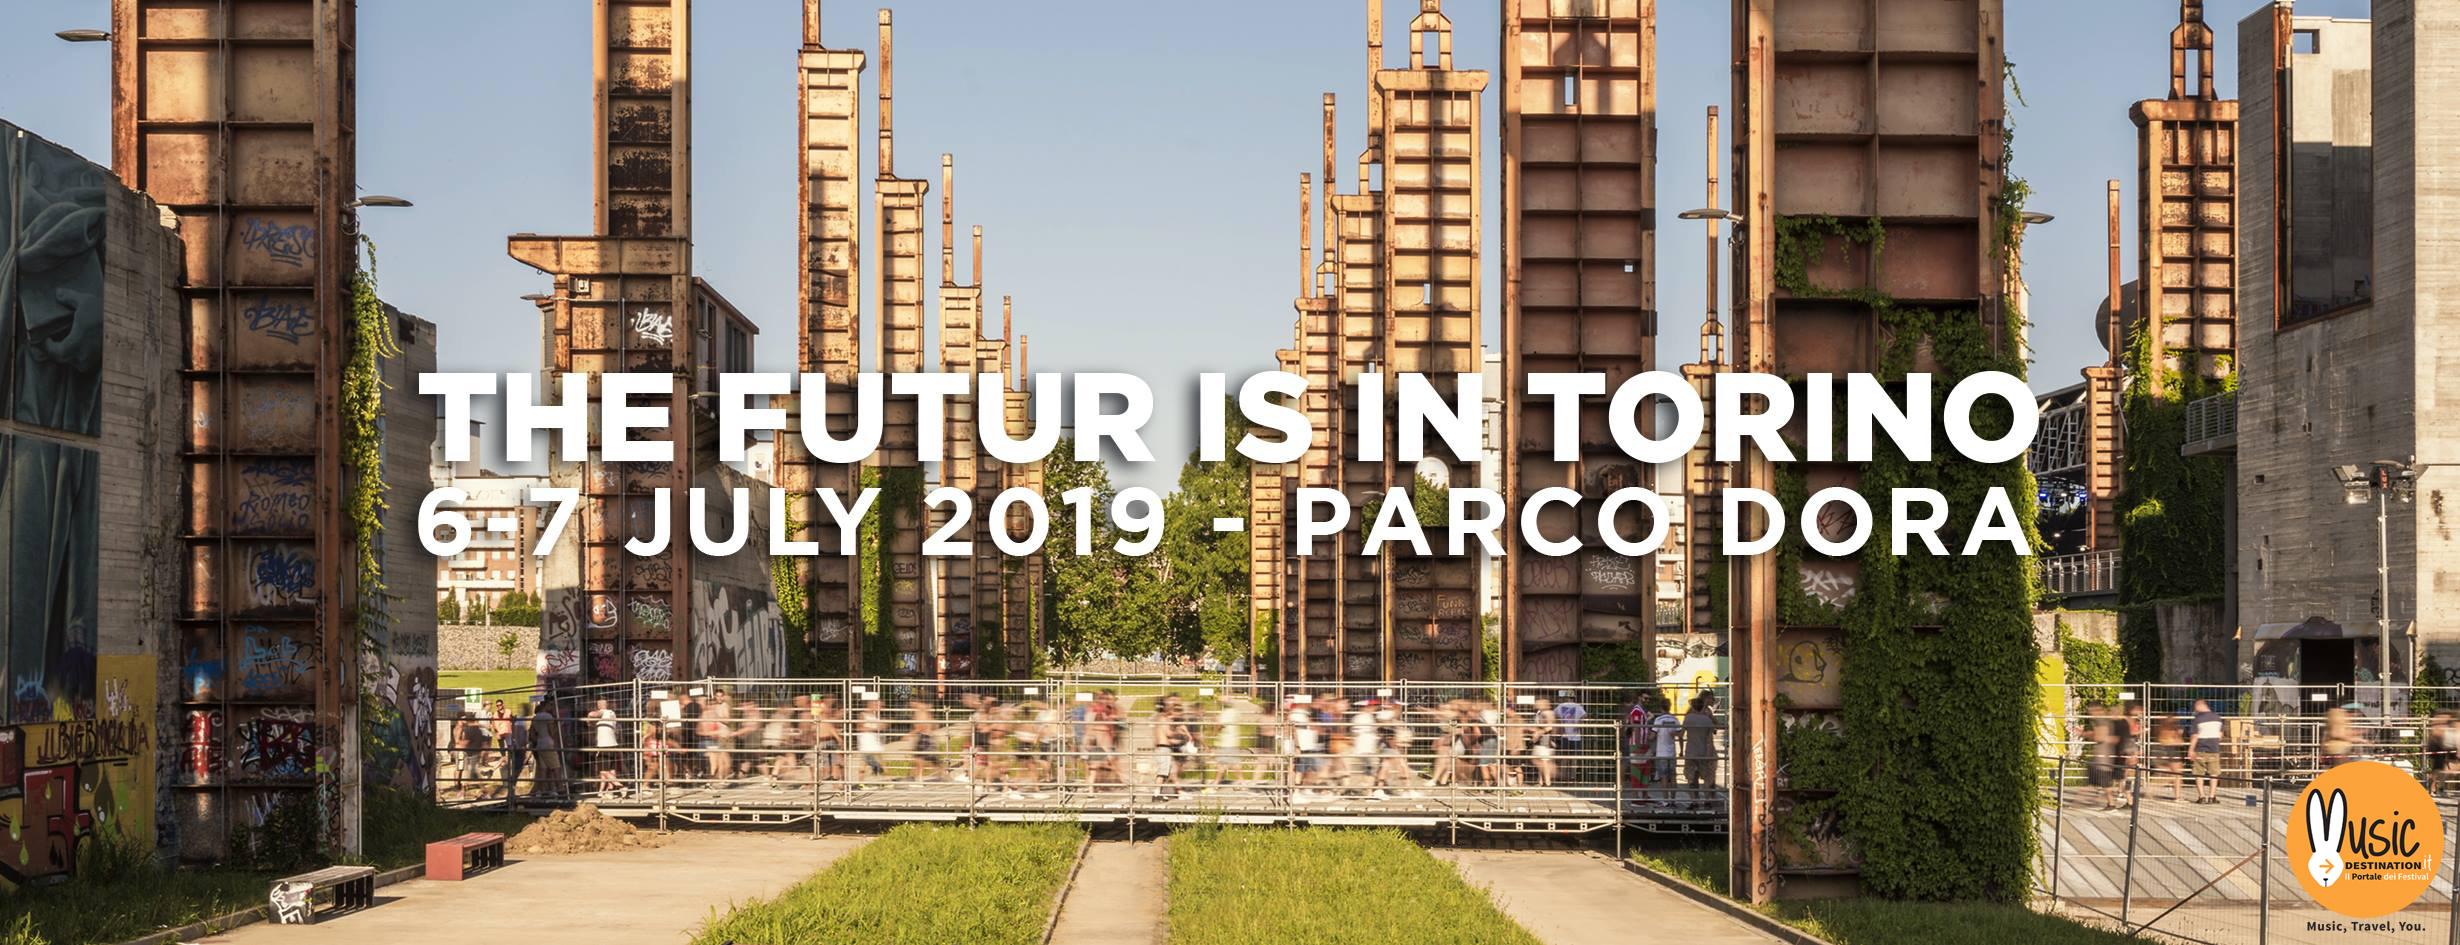 kappa futurfestival 2019 ticket pacchetti hotel